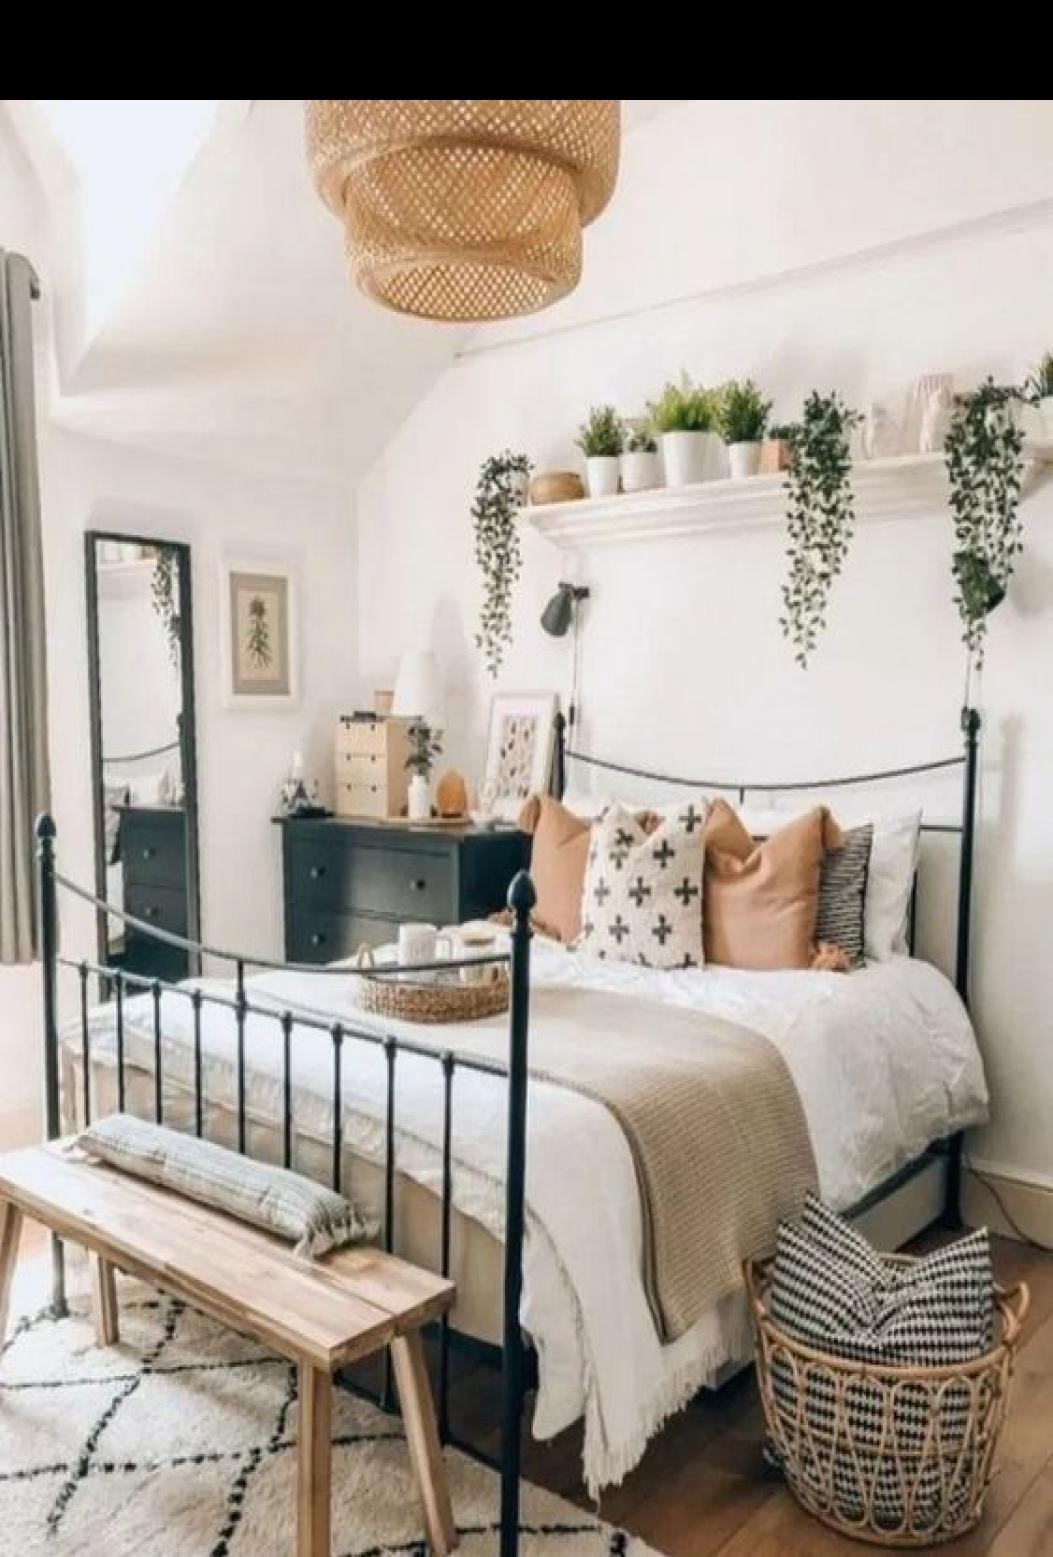 47 Cool Urban Farmhouse Master Bedroom Makeover Ideas in ... on Boho Master Bedroom Ideas  id=84078